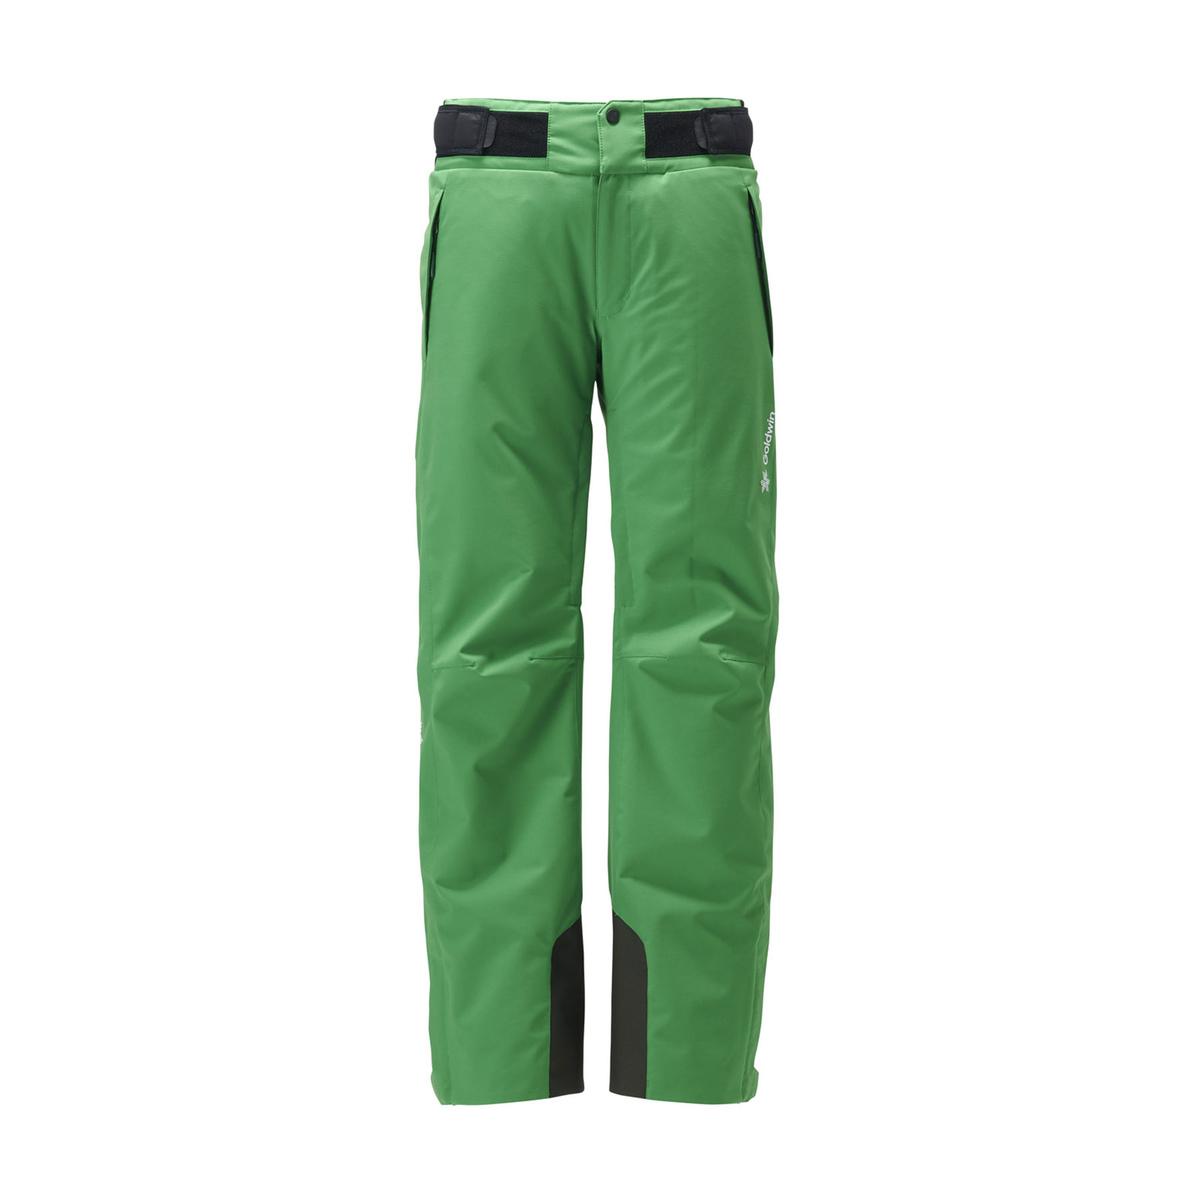 Prezzi Goldwin pantaloni STREAM